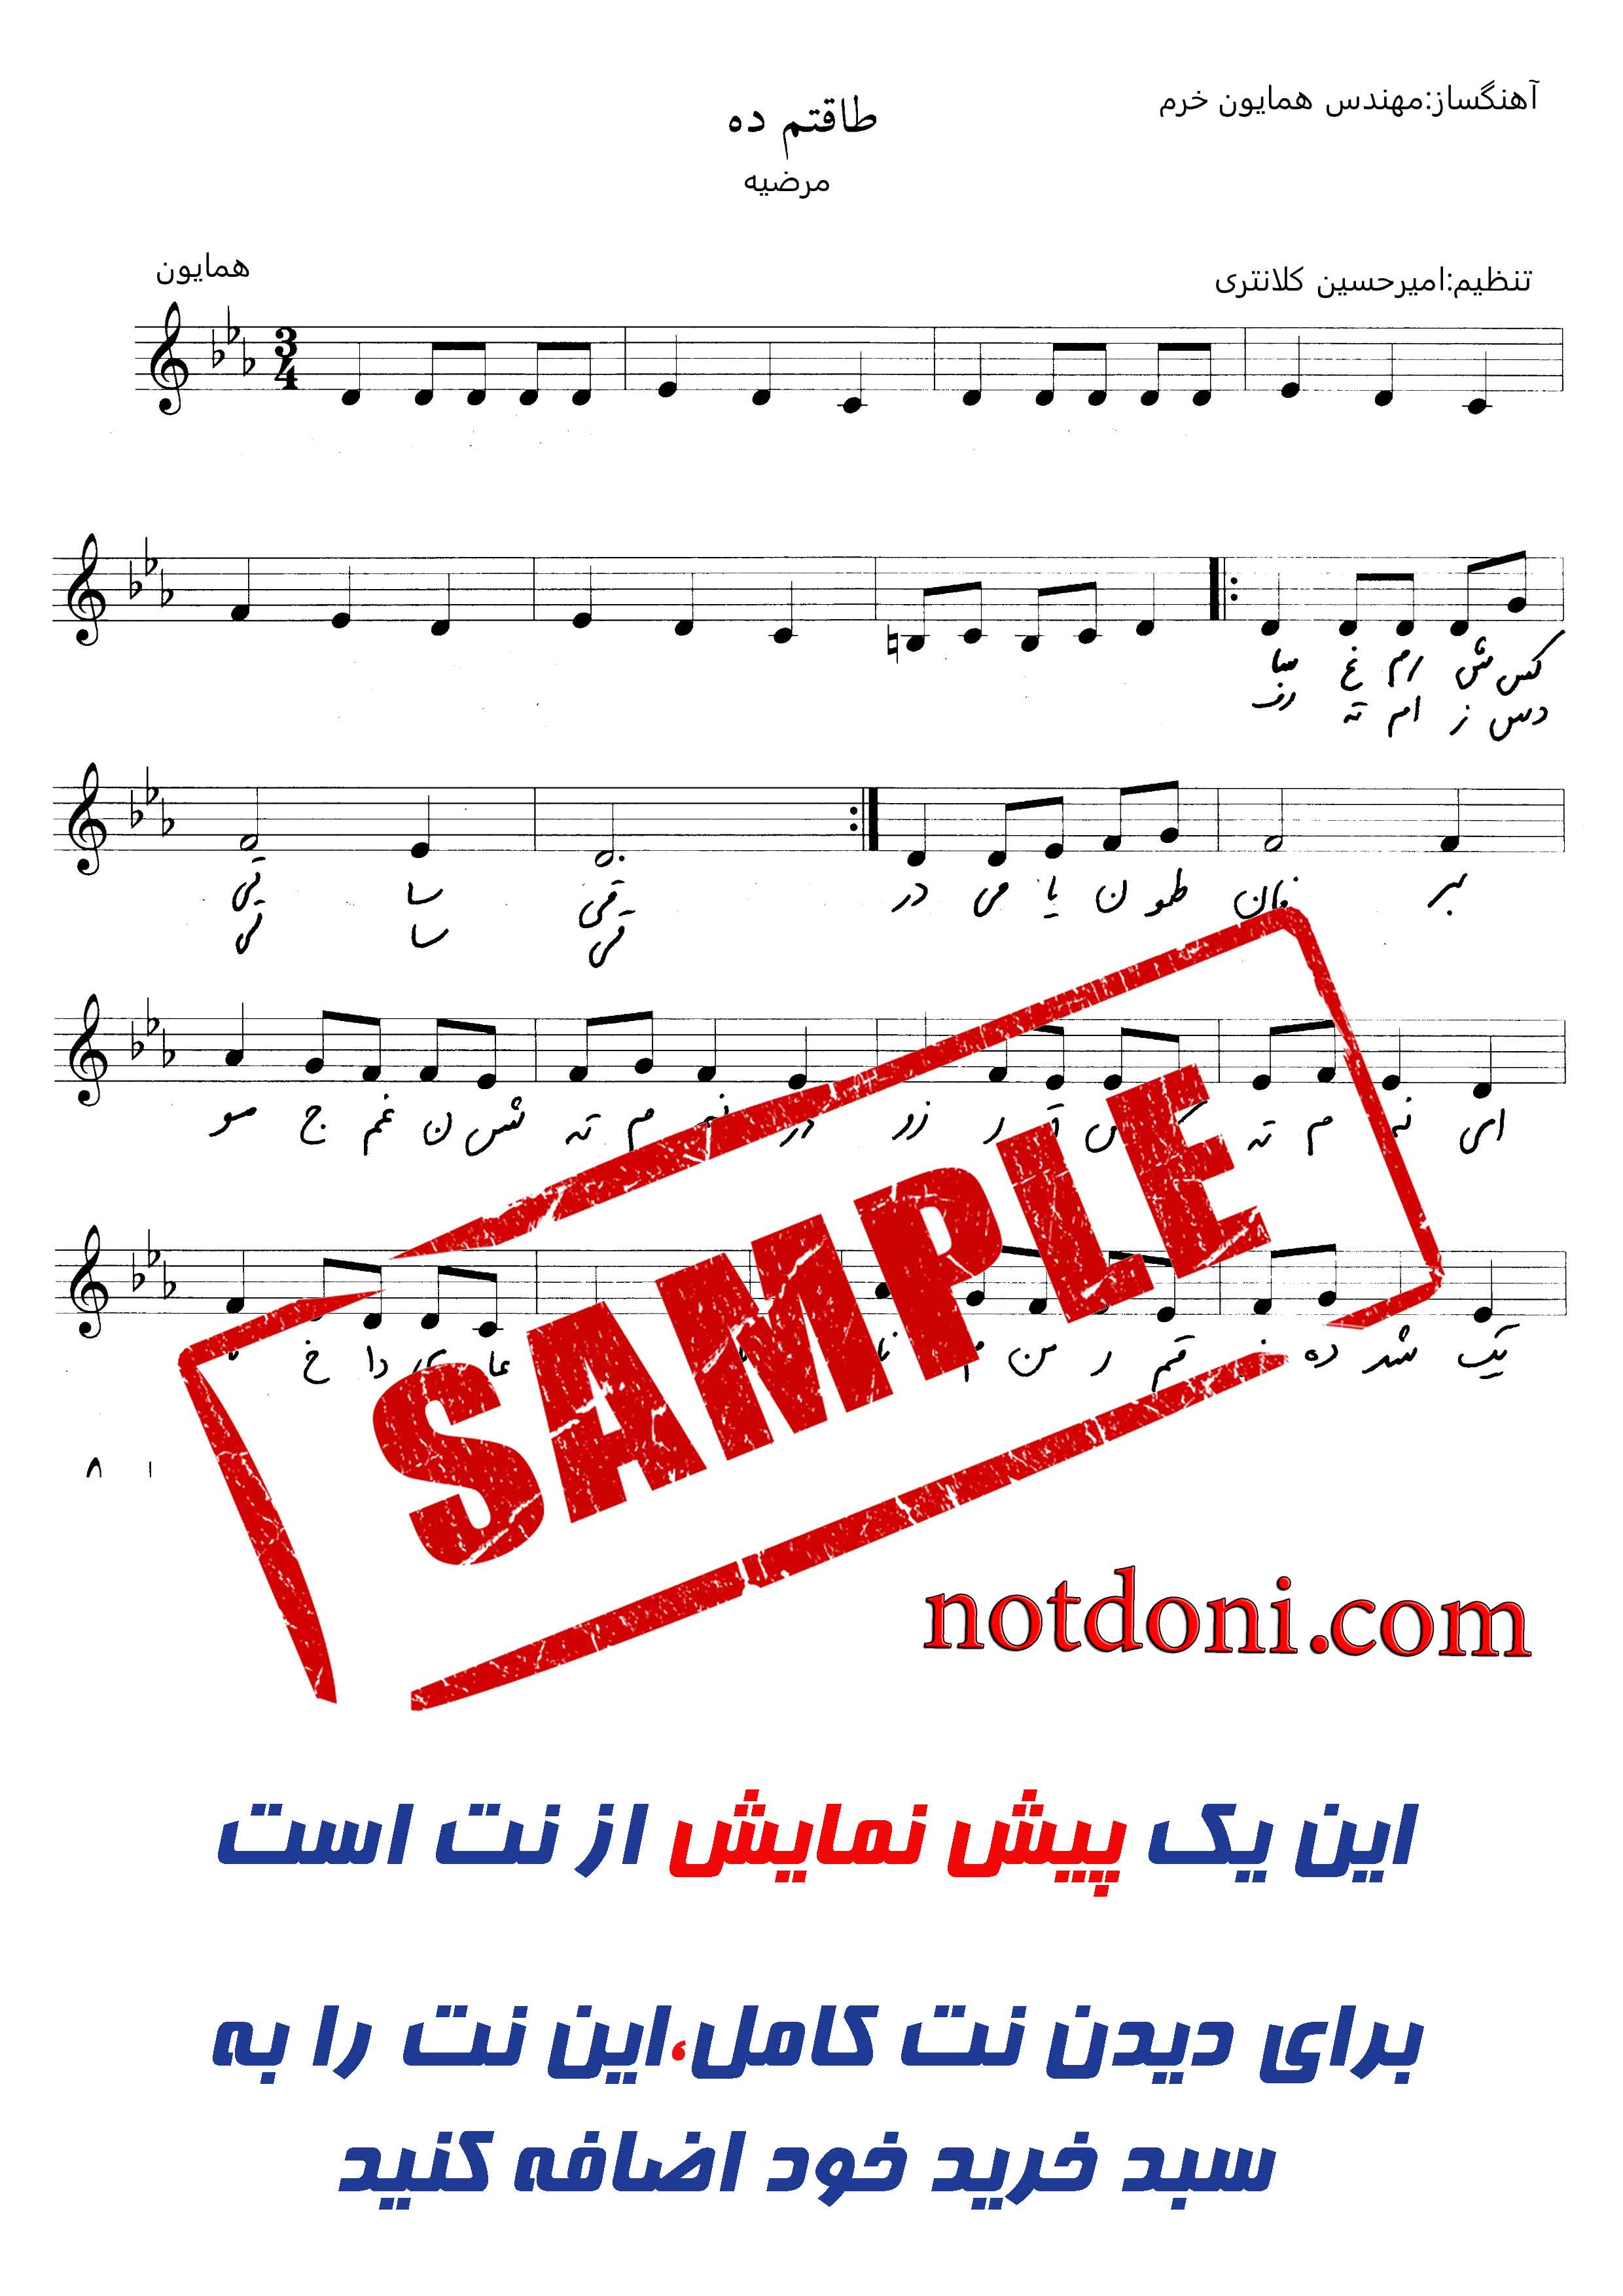 9ea1143f-6a70-4fd6-9623-cd840dd064da_نت-آهنگ.jpg